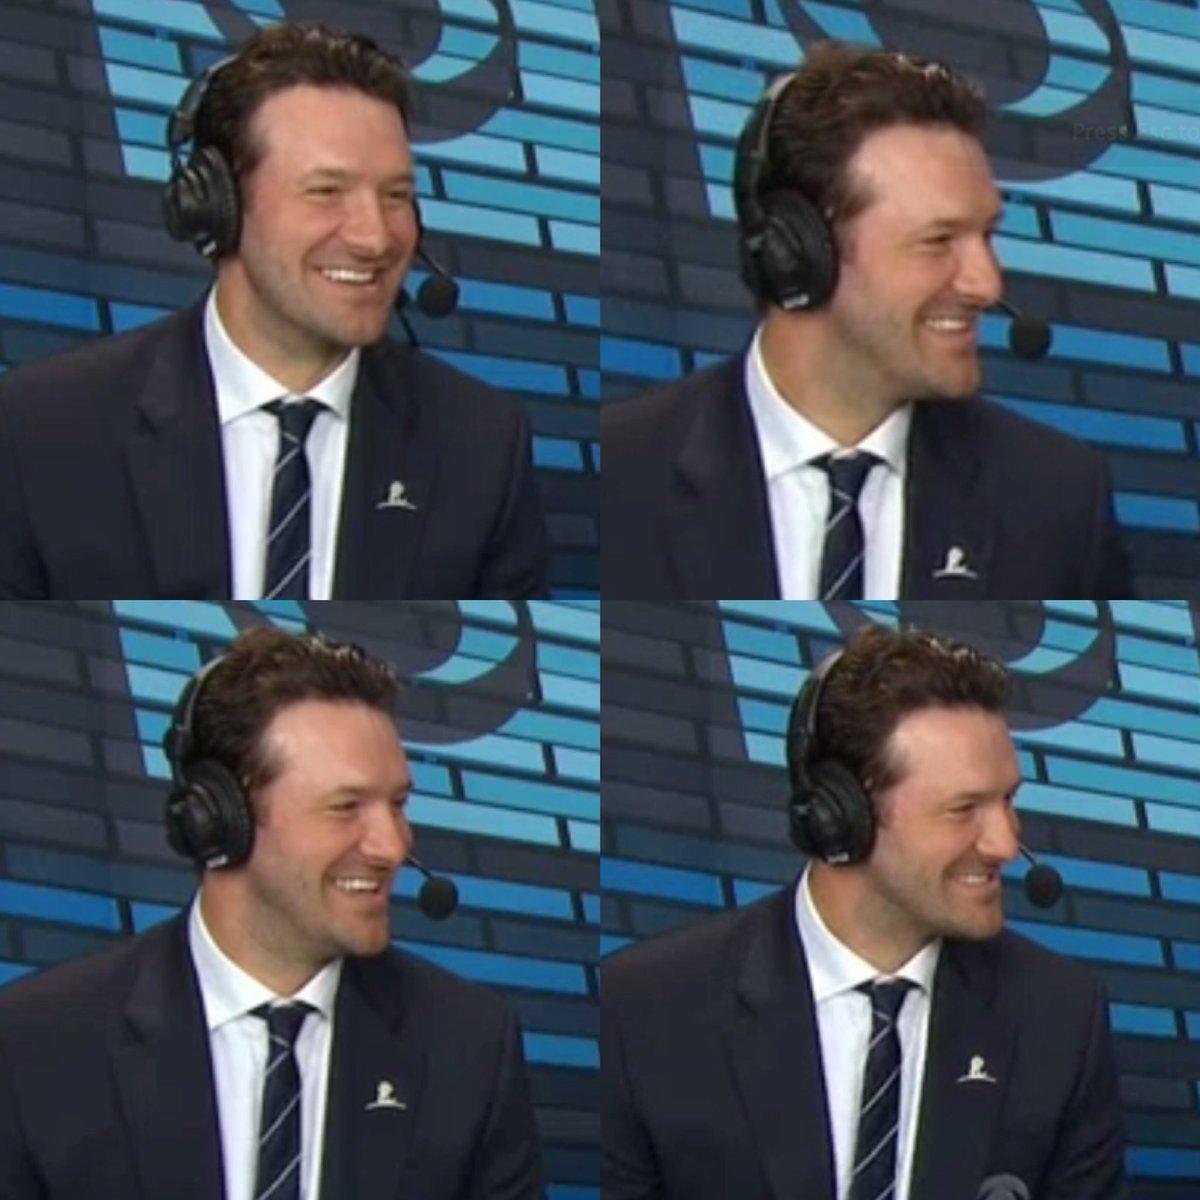 Tony Romo is the happiest man in America https://t.co/NanRCymakl